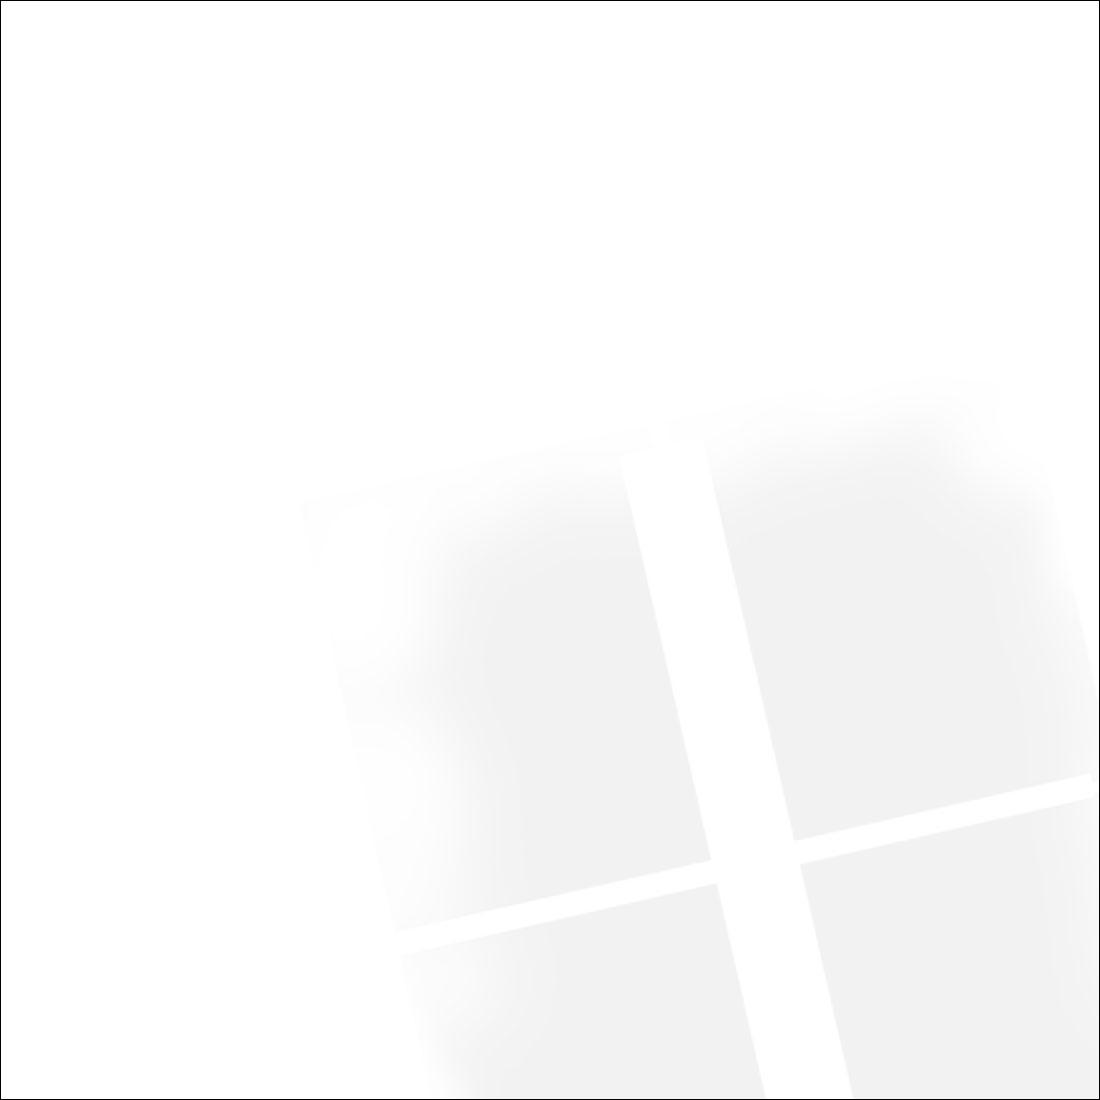 KRONOTEX Laminat Glamour Gloss Art white D2935 Hochglanz XL Fliesenoptik ohne Fuge Artikel-Nr.: D2935 – Bild 2